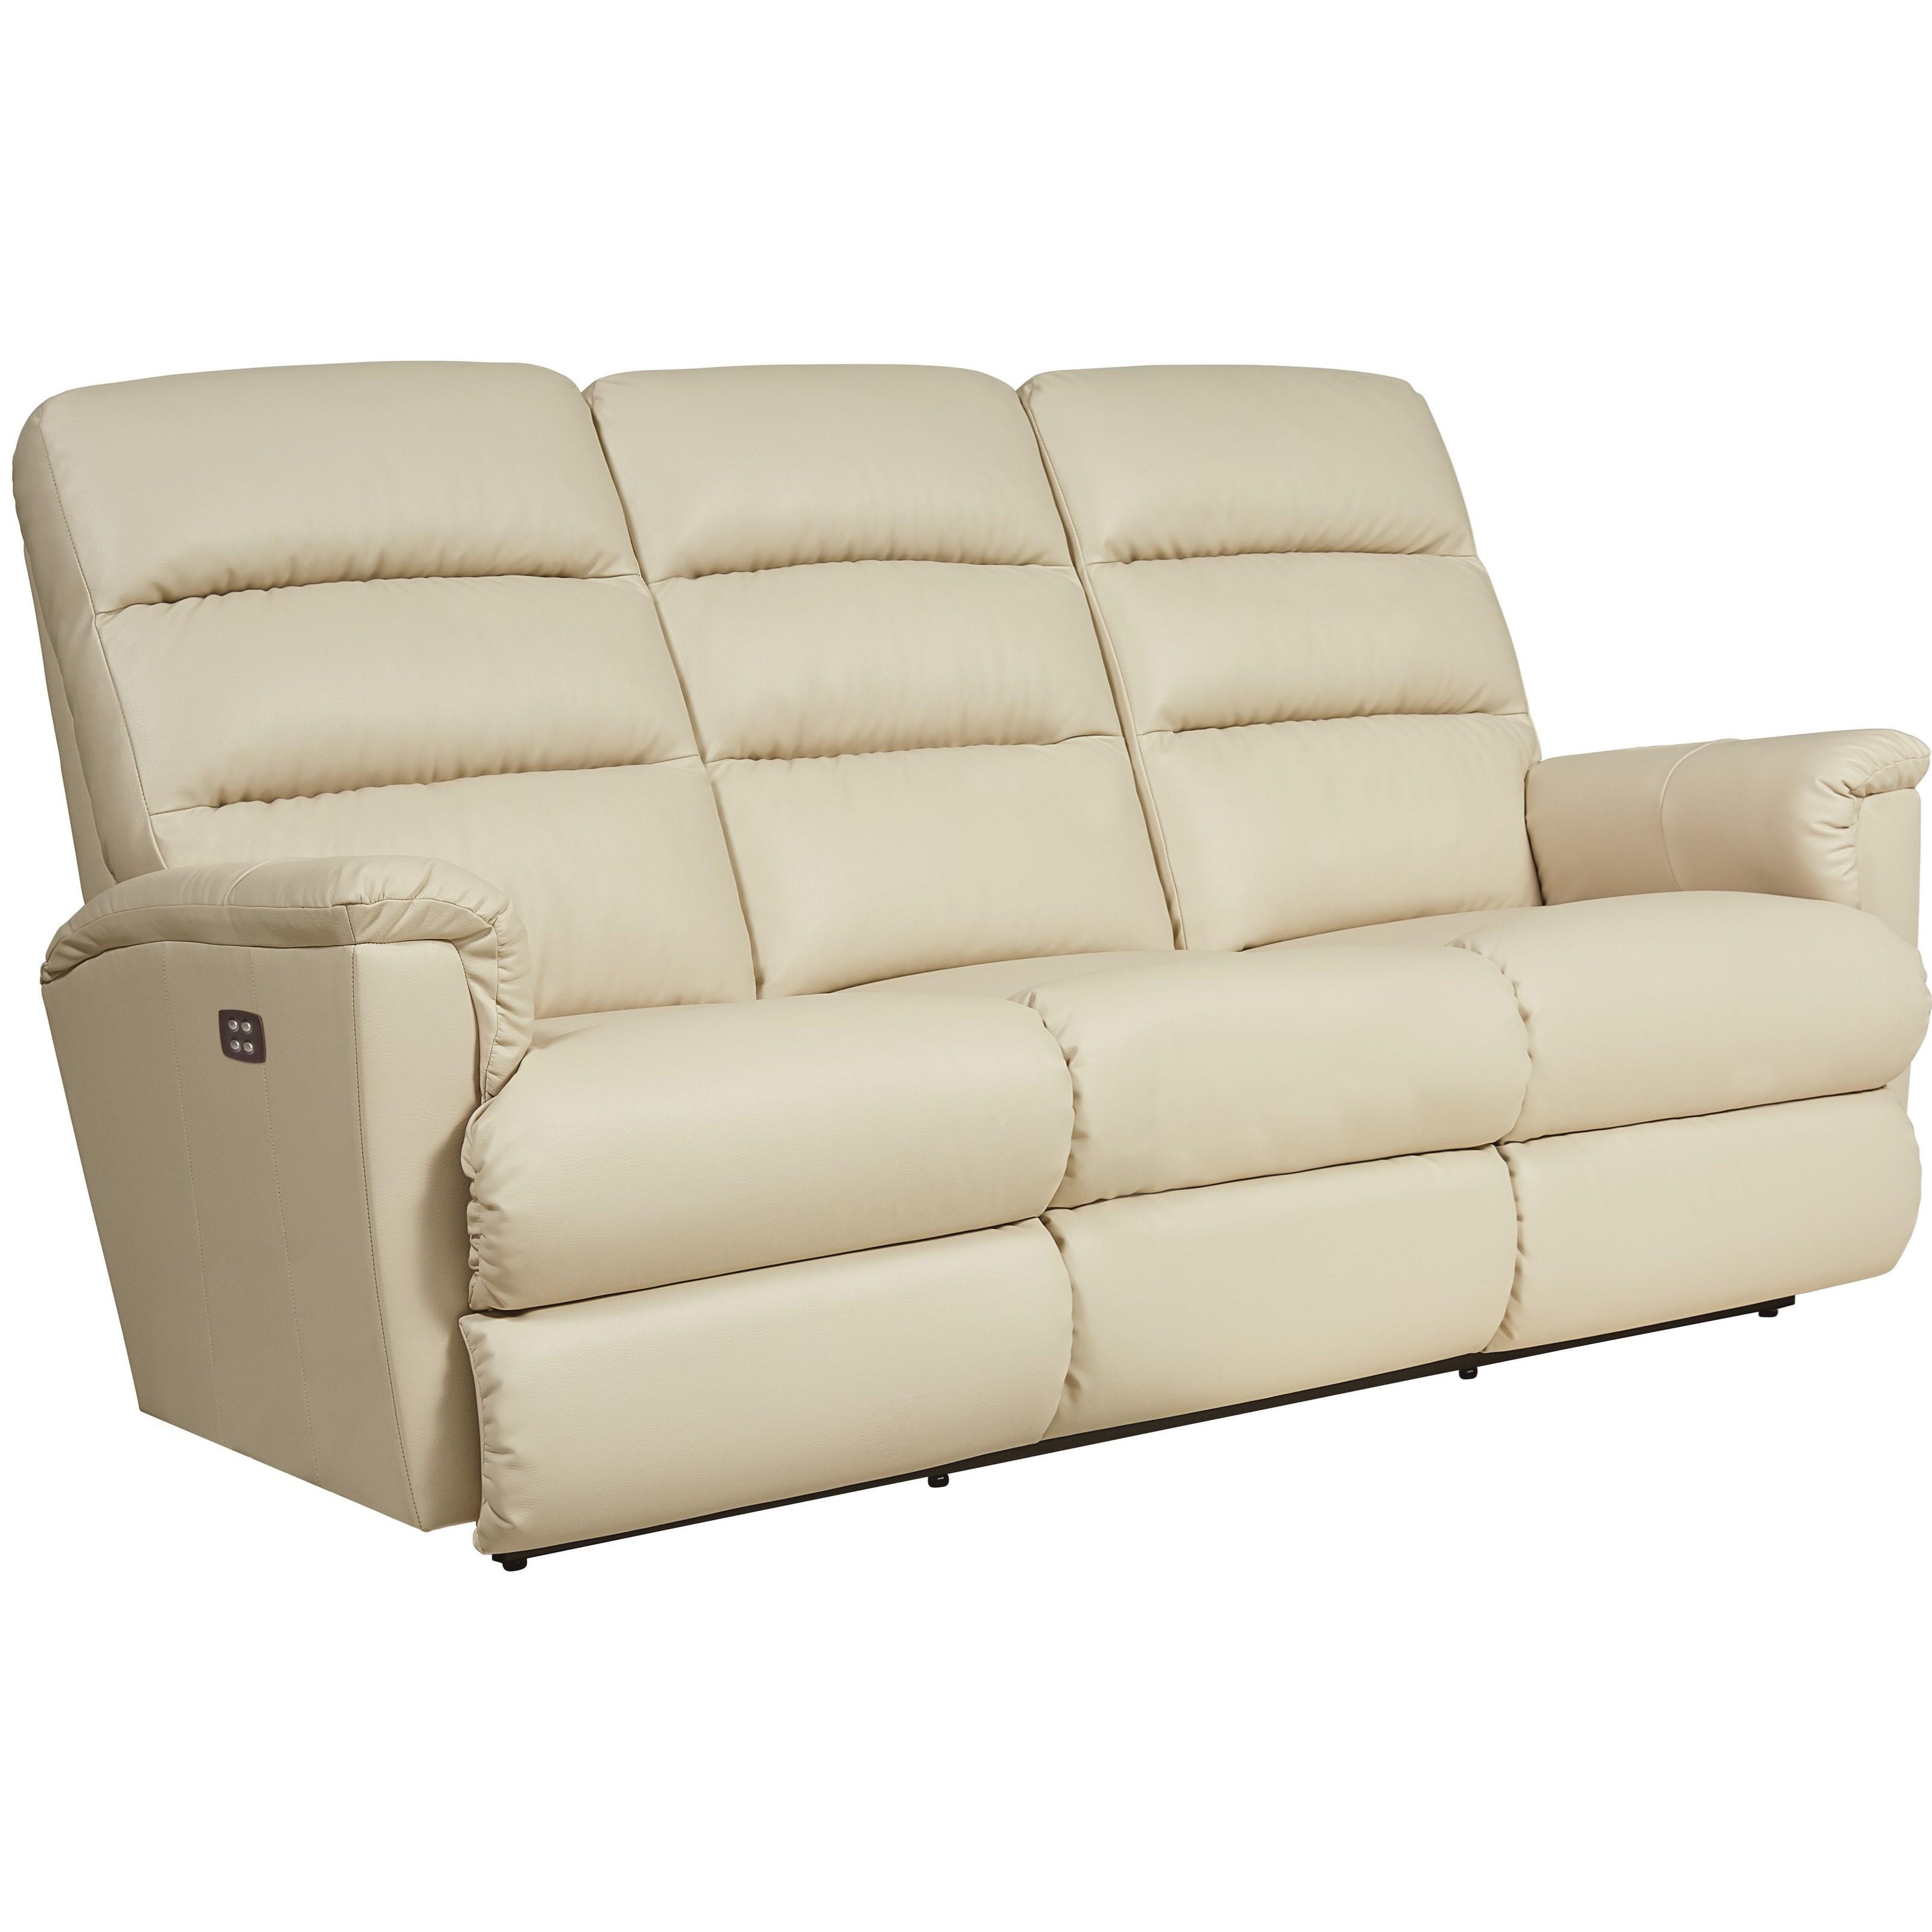 Tripoli Power-Recline-XRw™Full Reclining Sofa by La-Z-Boy at Sparks HomeStore